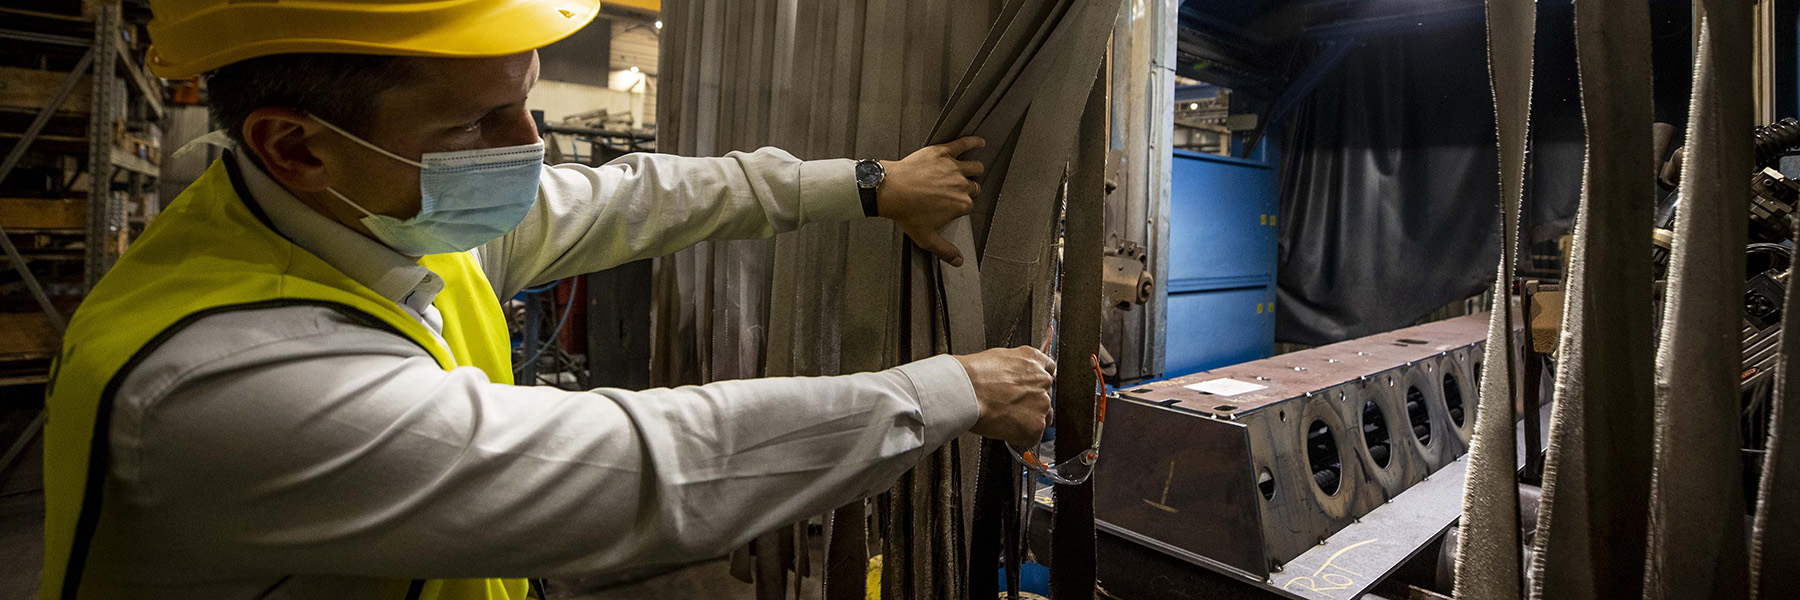 Ján Bujňák introduced DELTABEAM<sup>®</sup> production line in Peikko Slovakia's factory